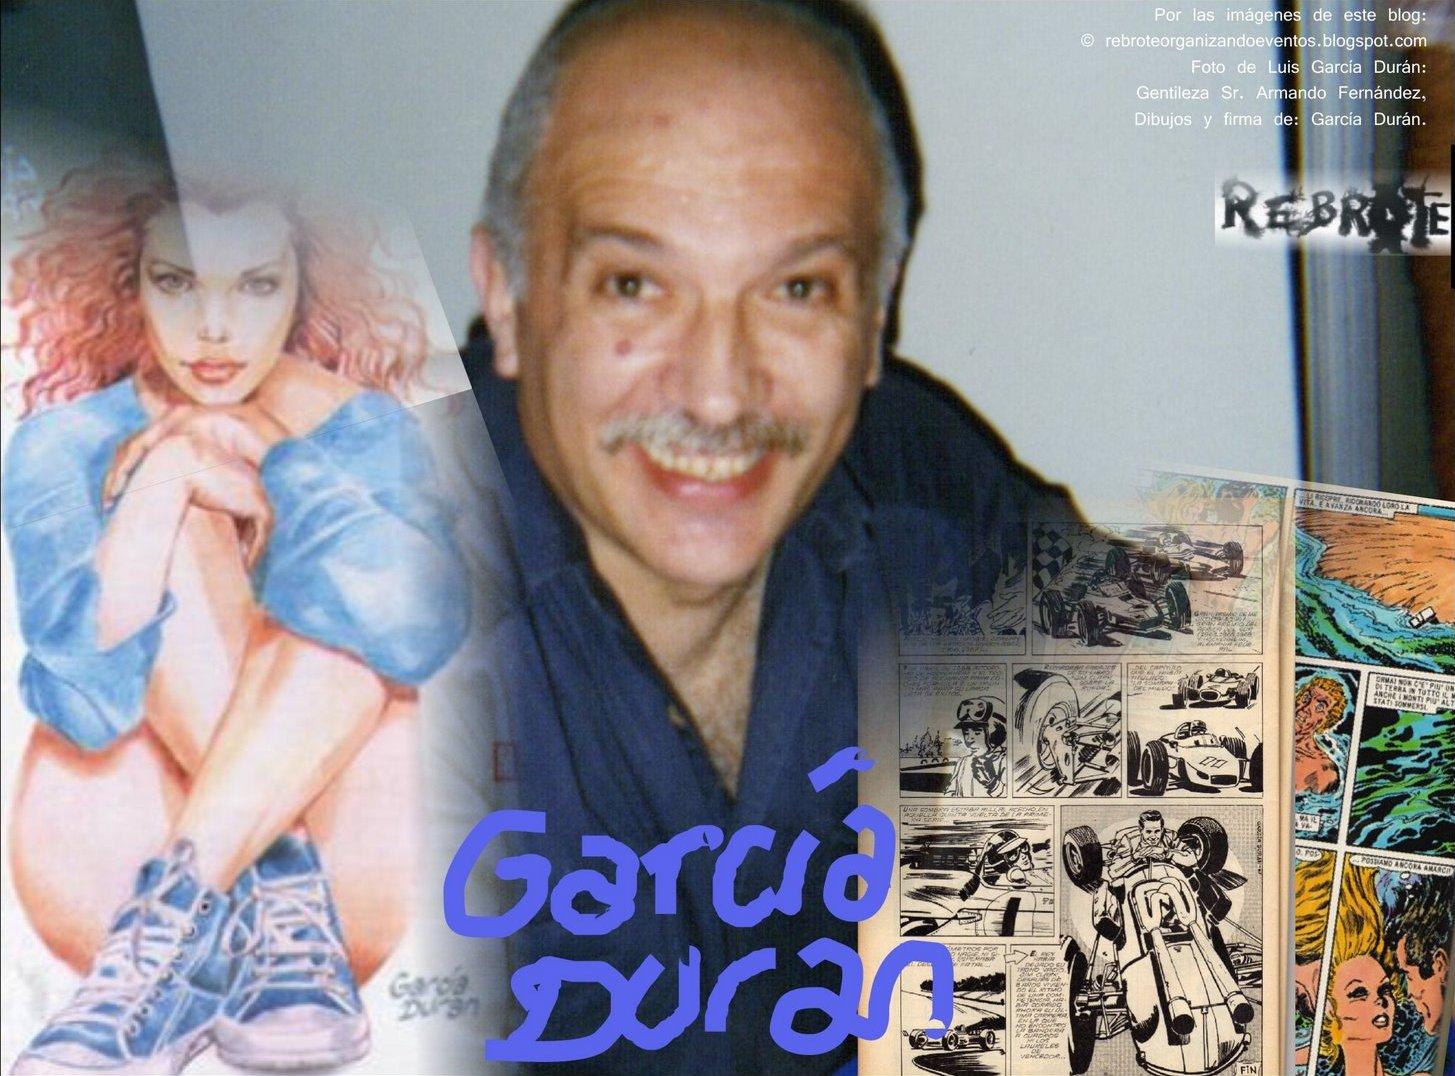 Luis Garcia Duran